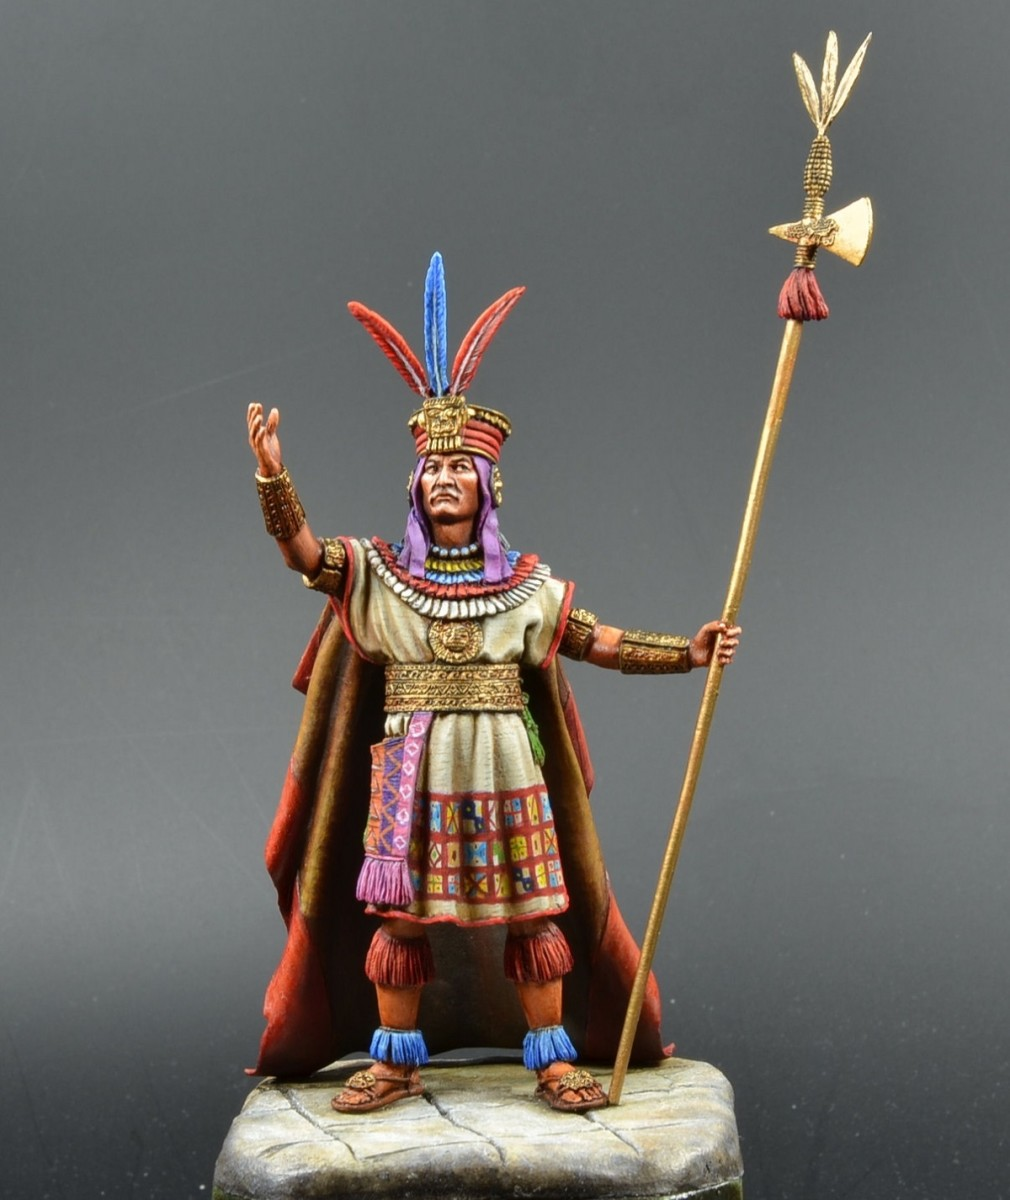 Emperor Atahualpa